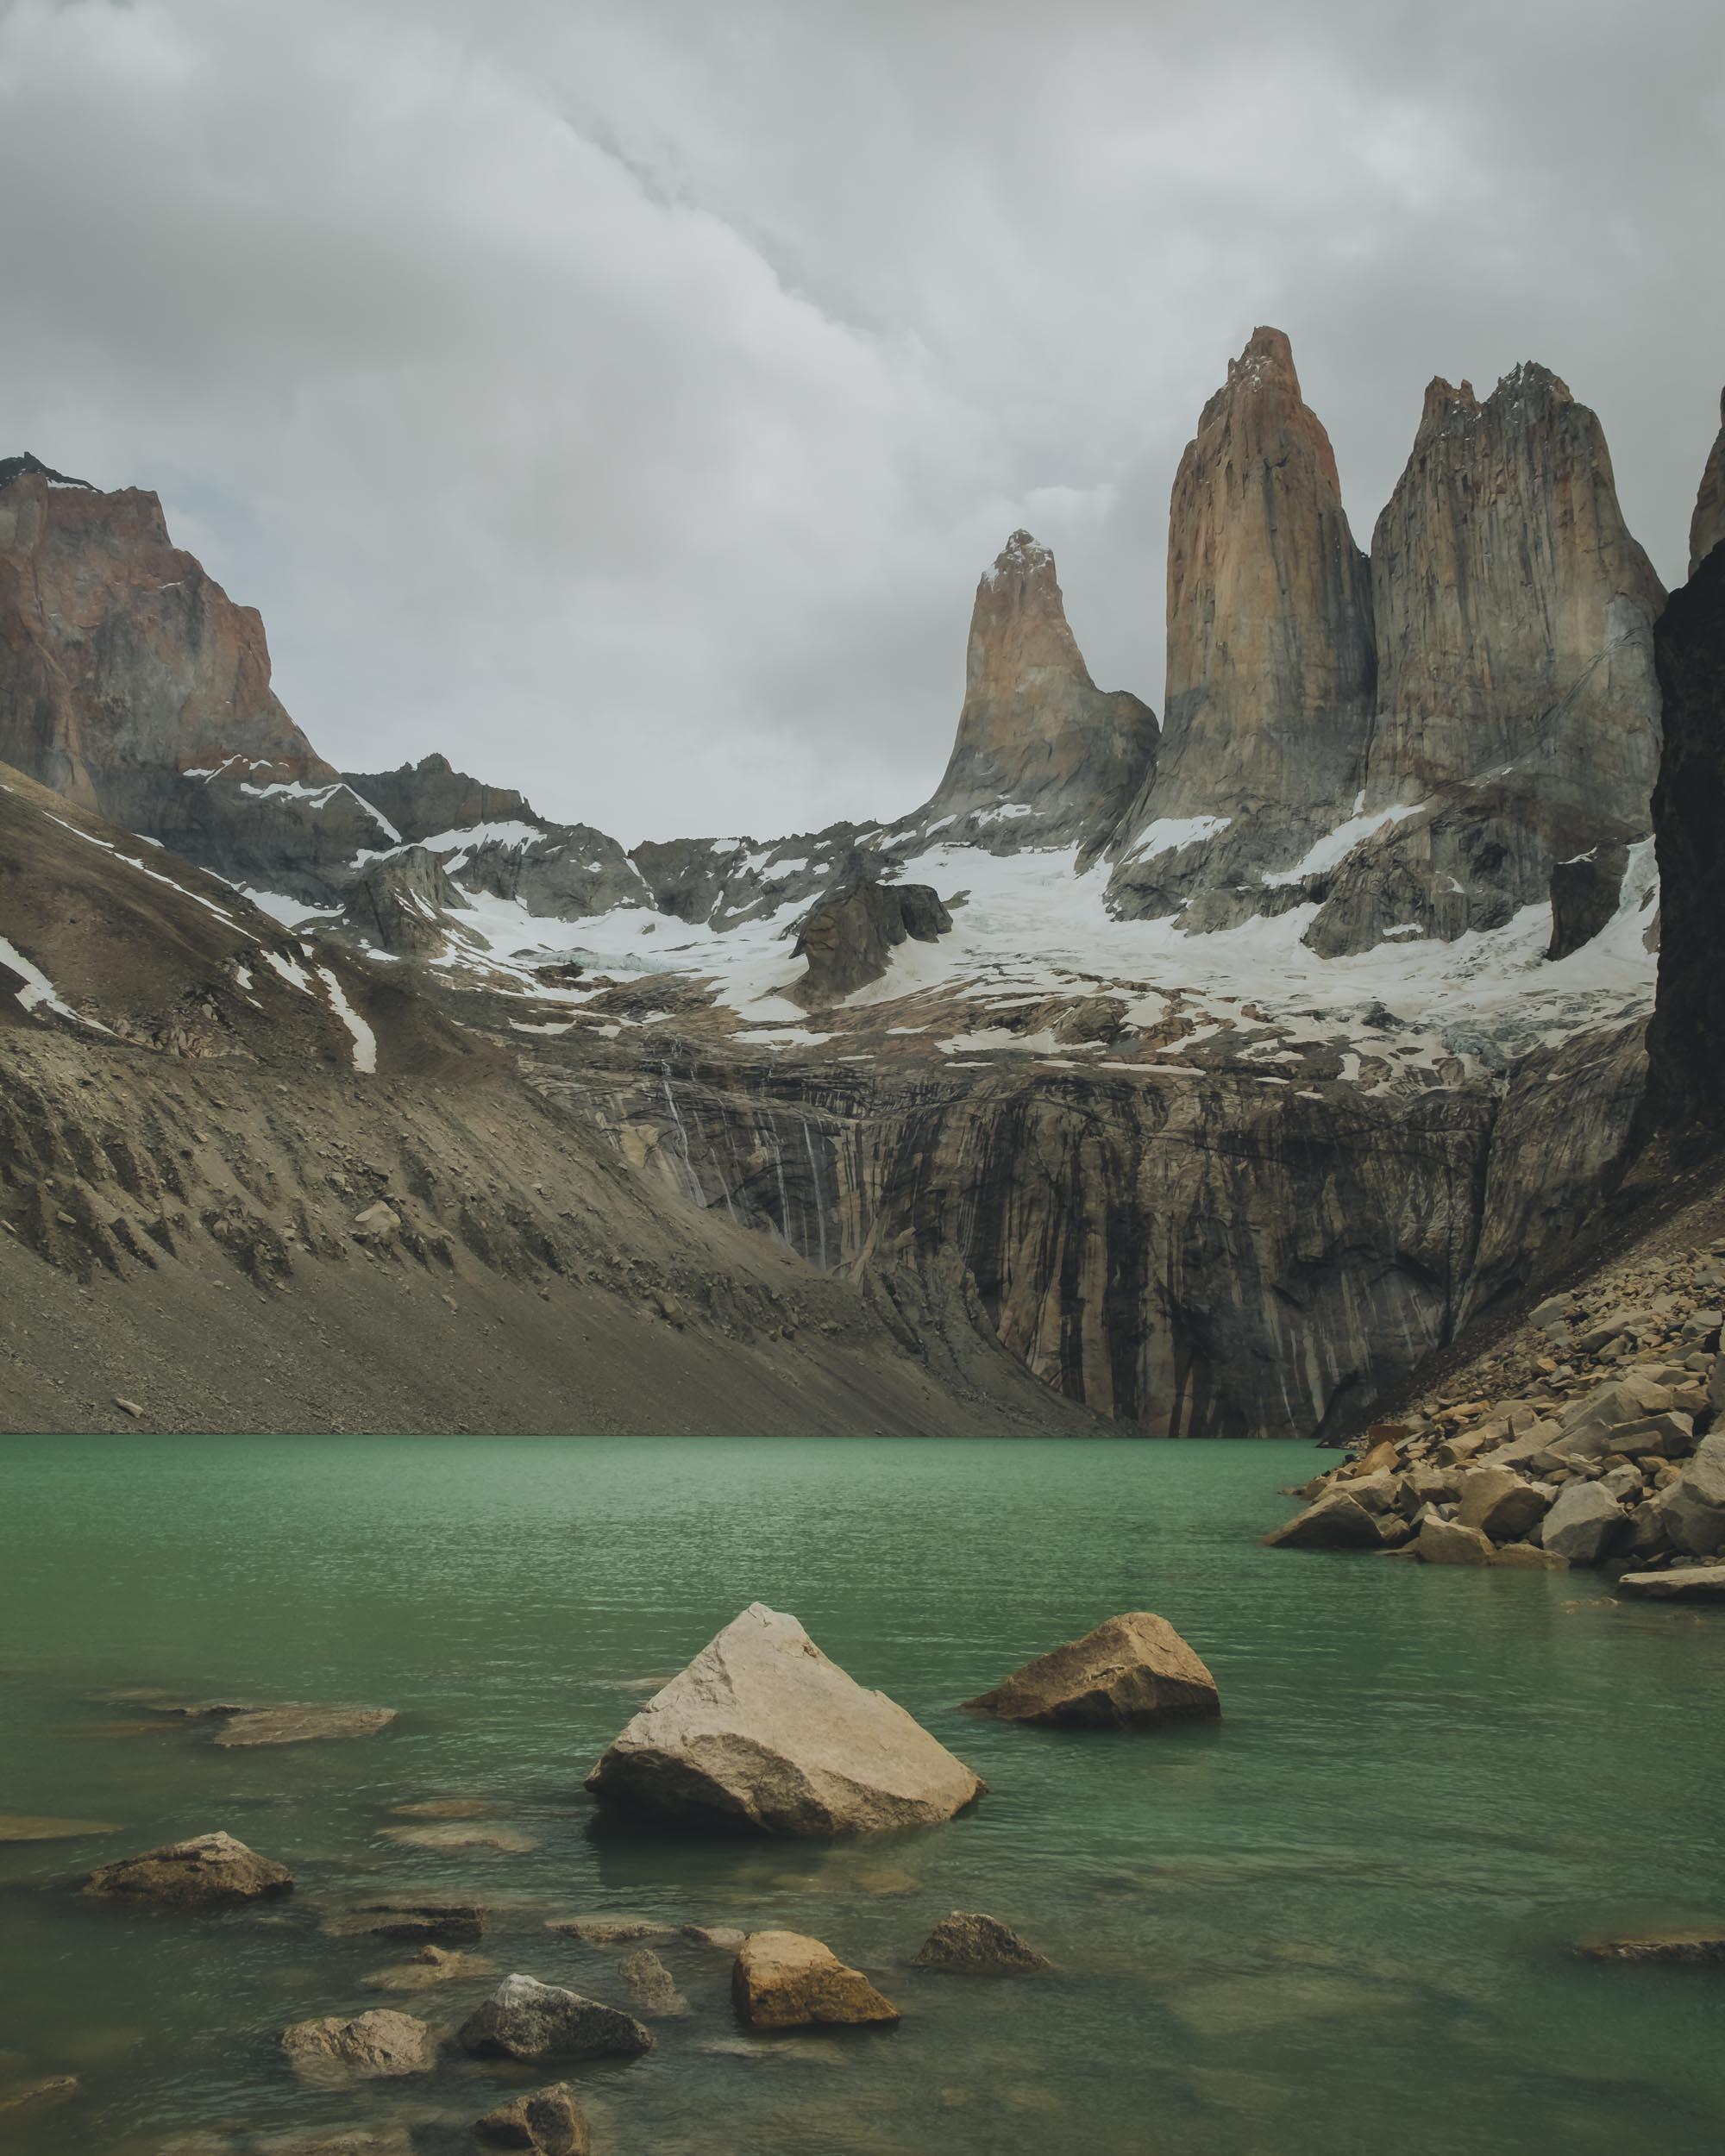 Chile-20171213-003730.jpg